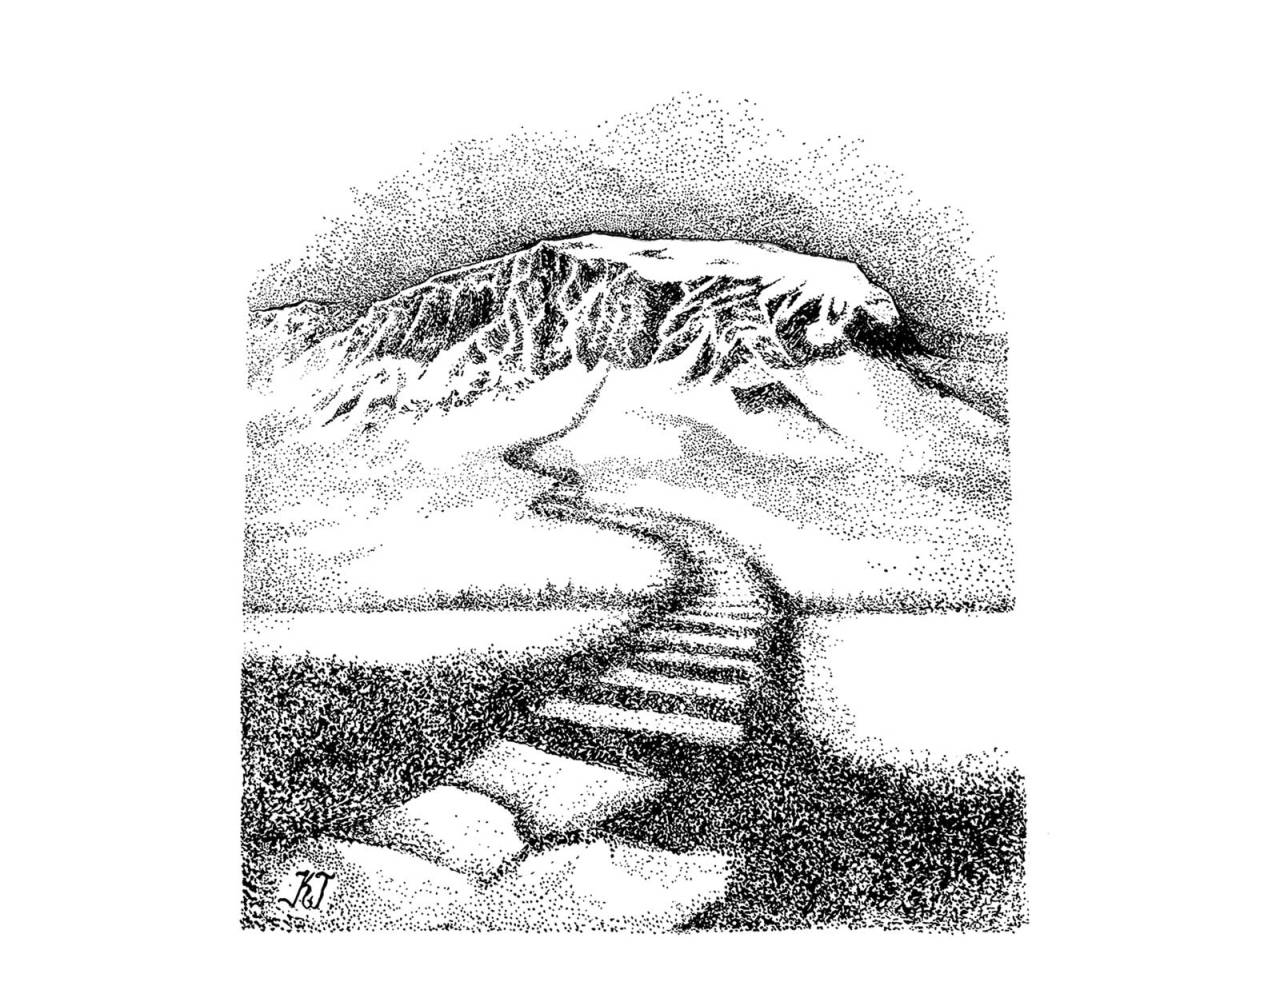 trapper i fjellet